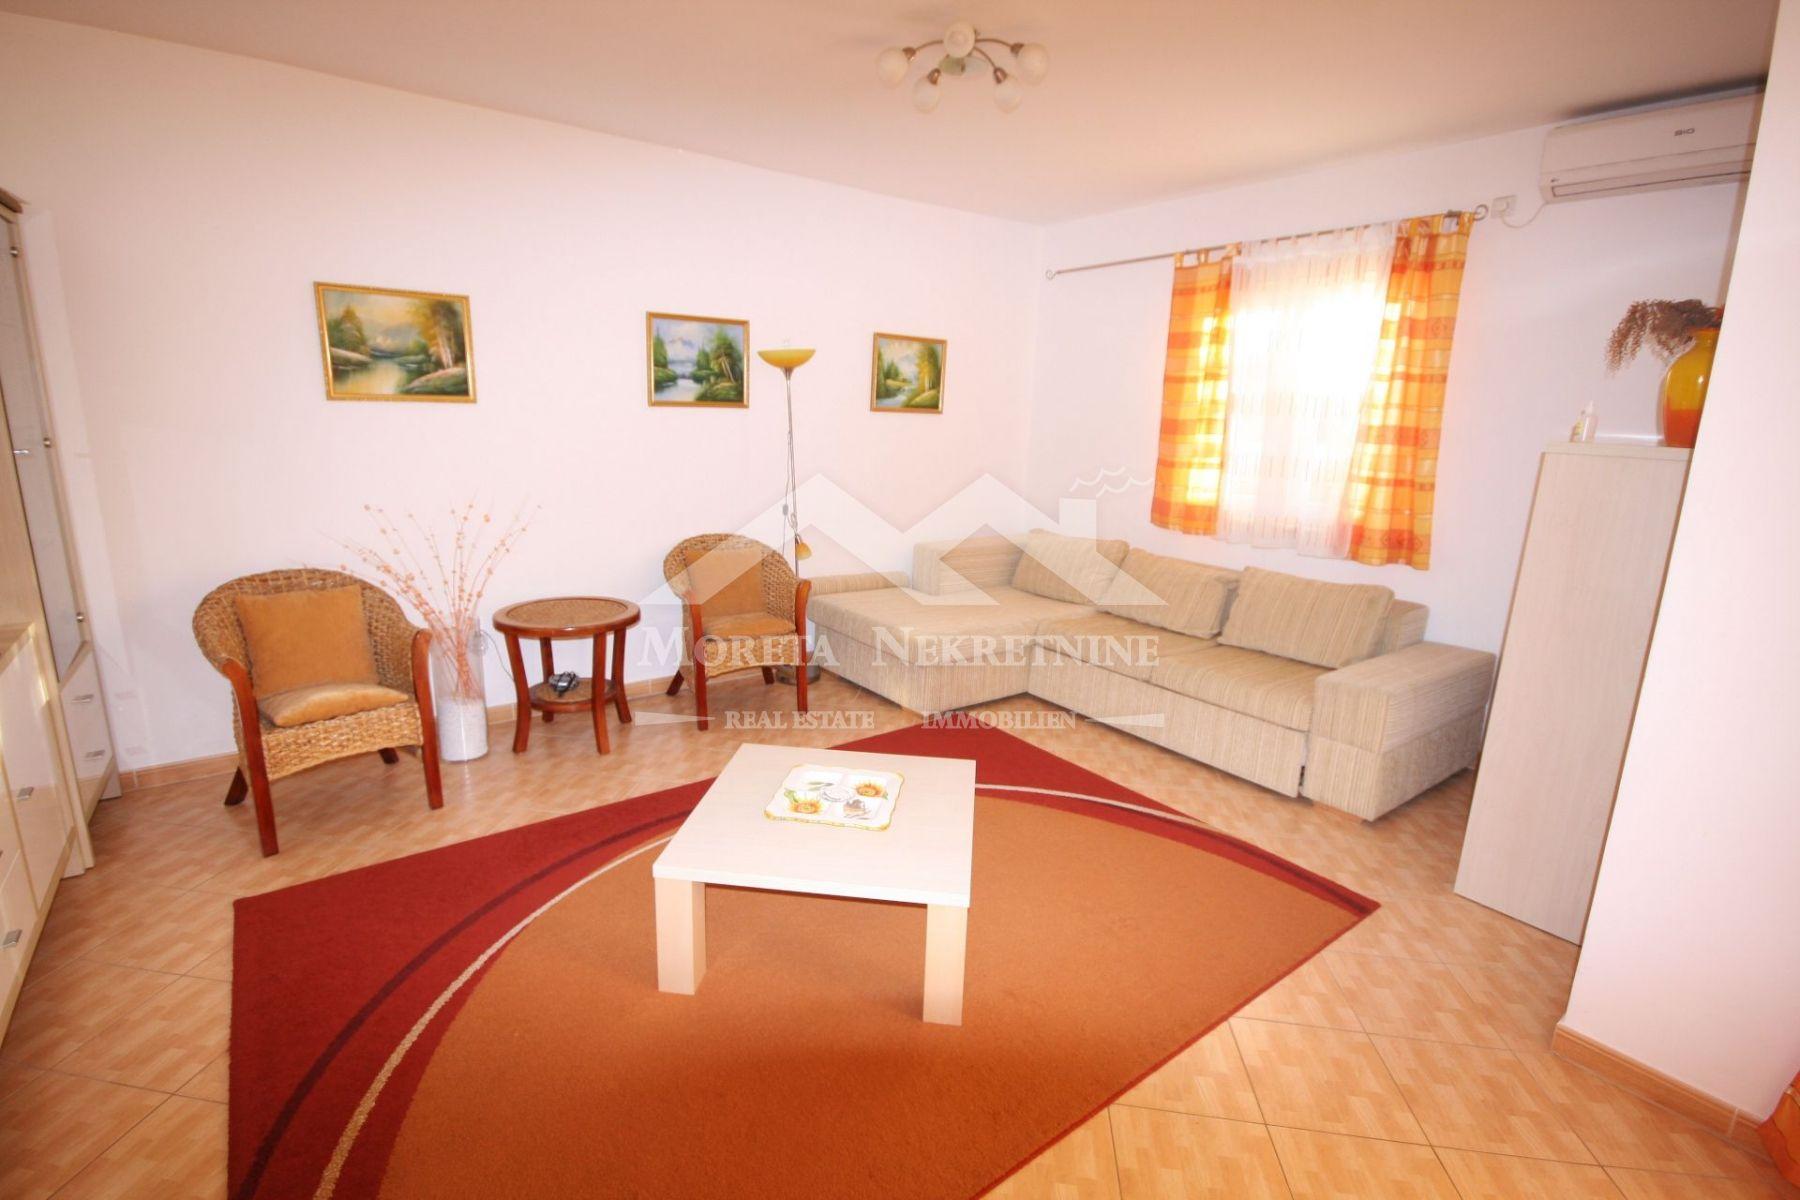 Vodice, spacious duplex apartment in an excellent location